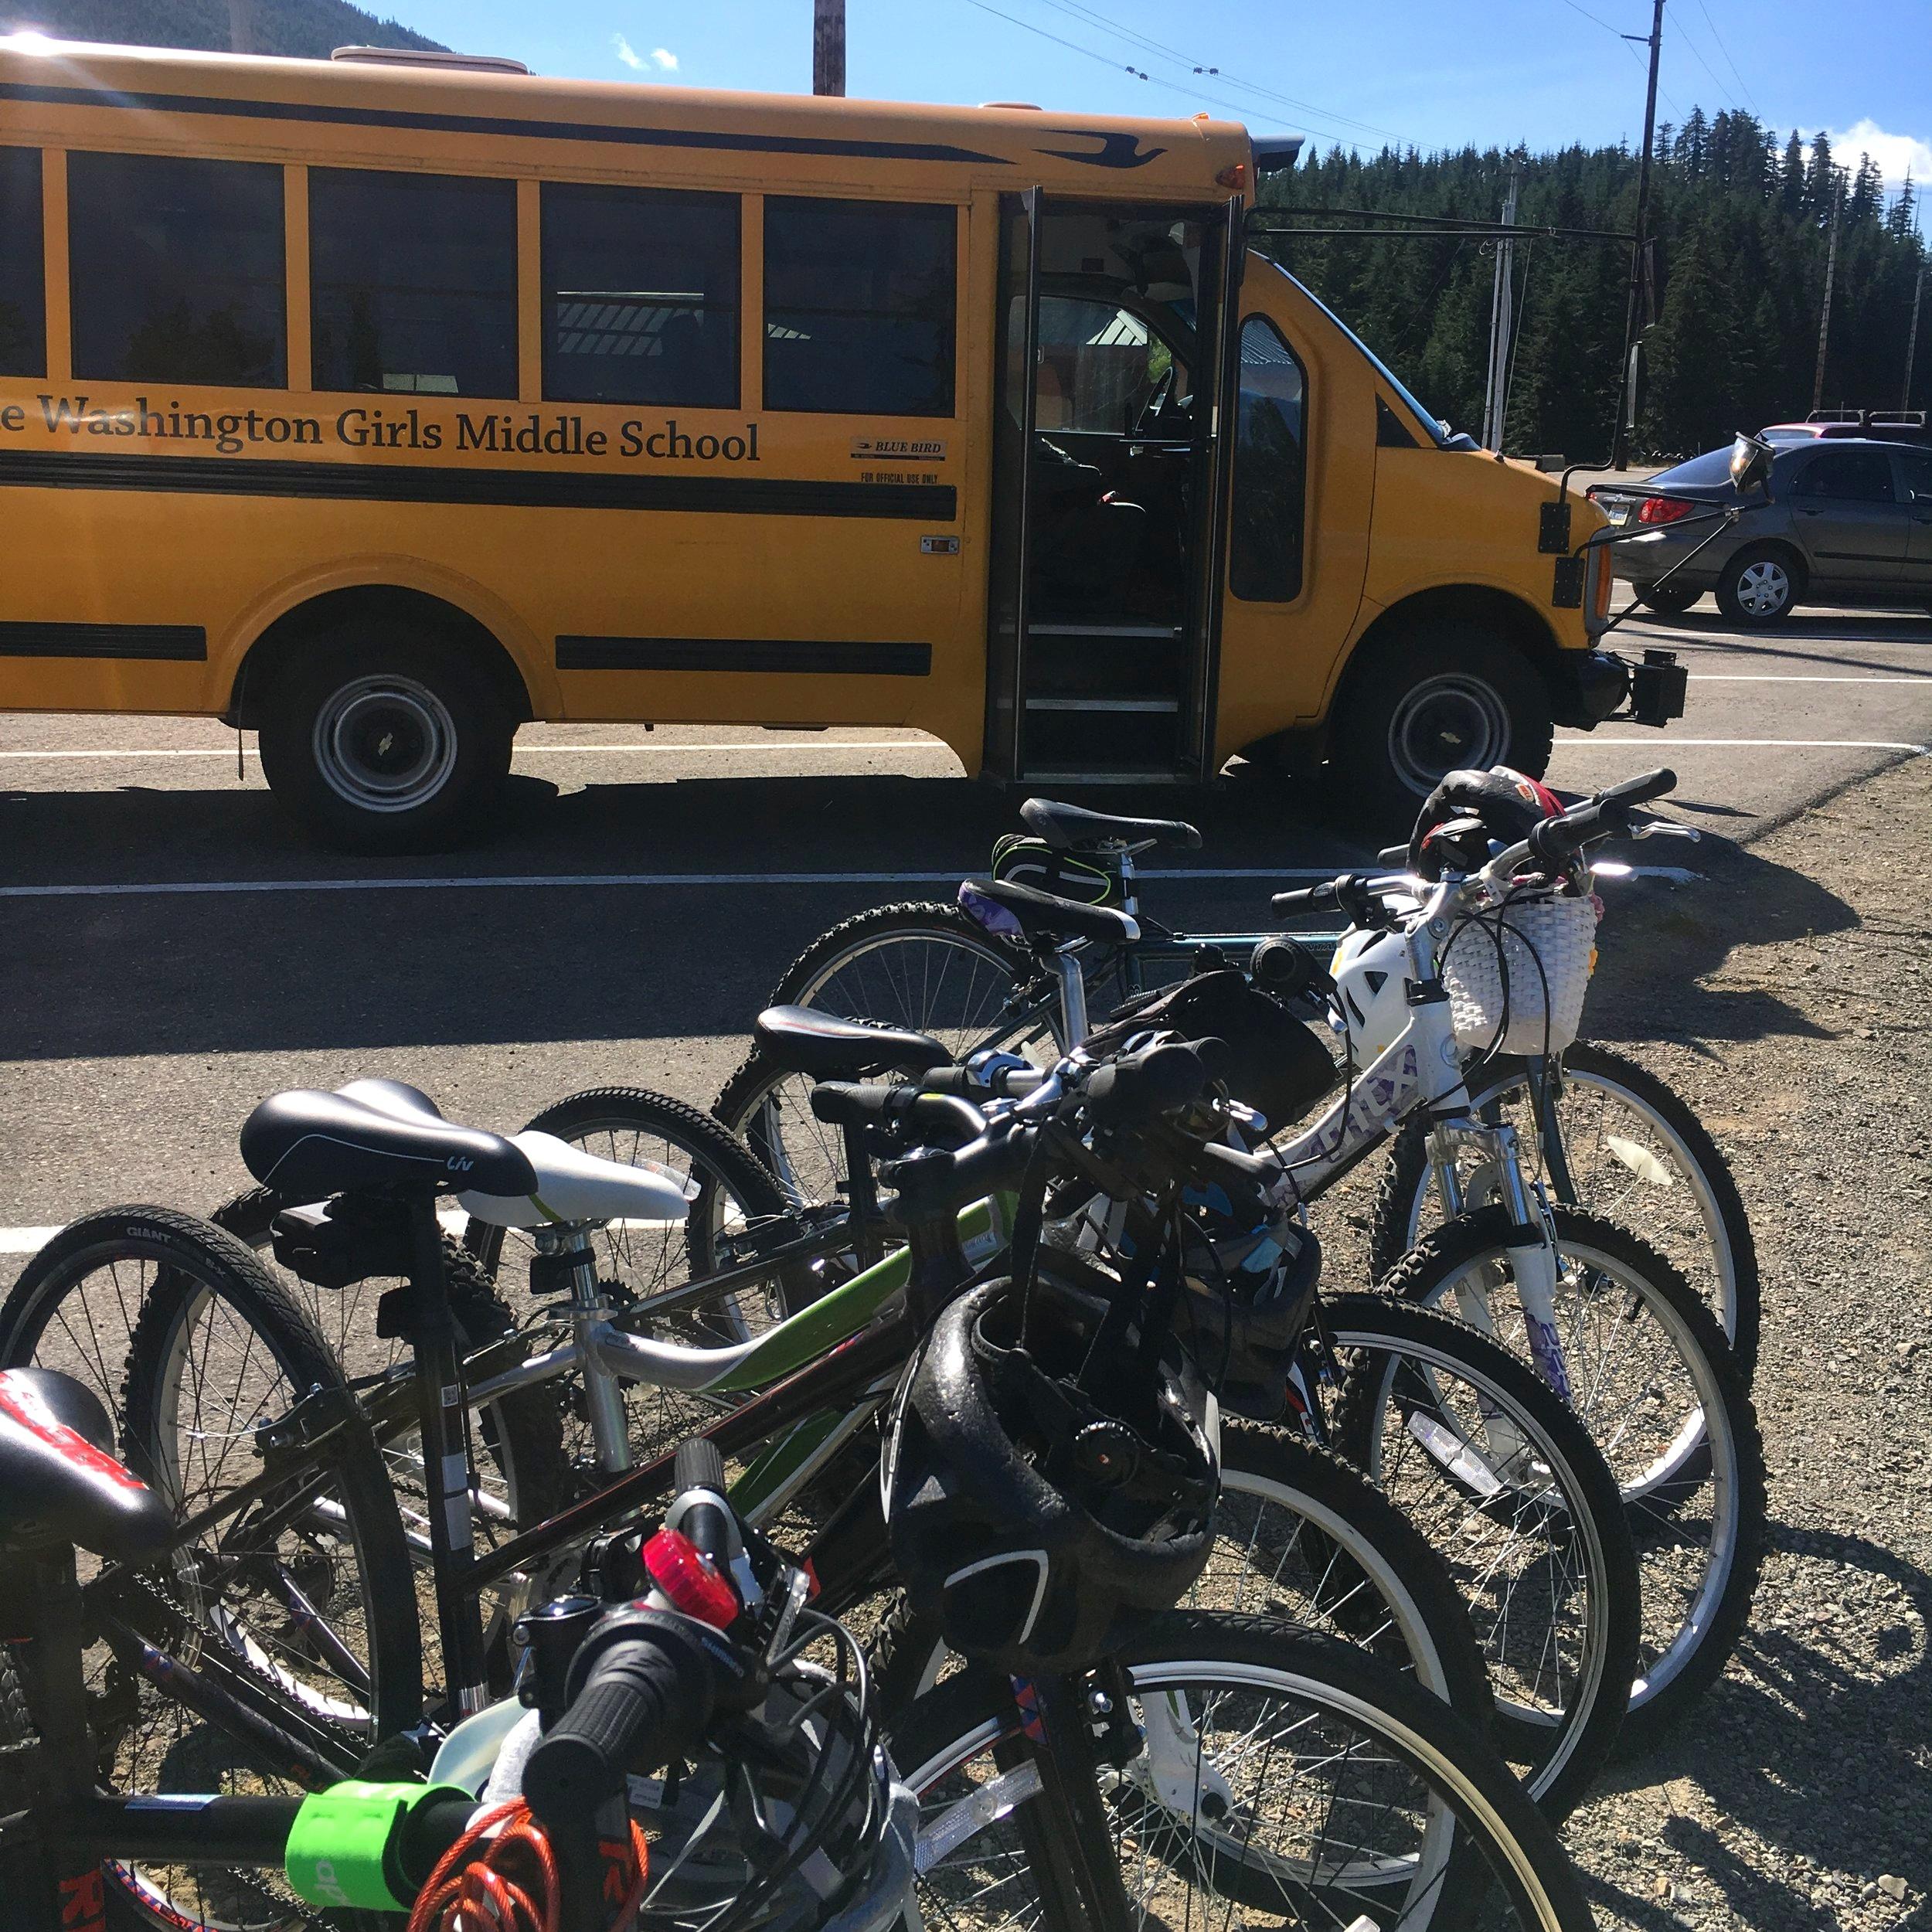 Lake Washington Girls Middle School Bike Camp 2019